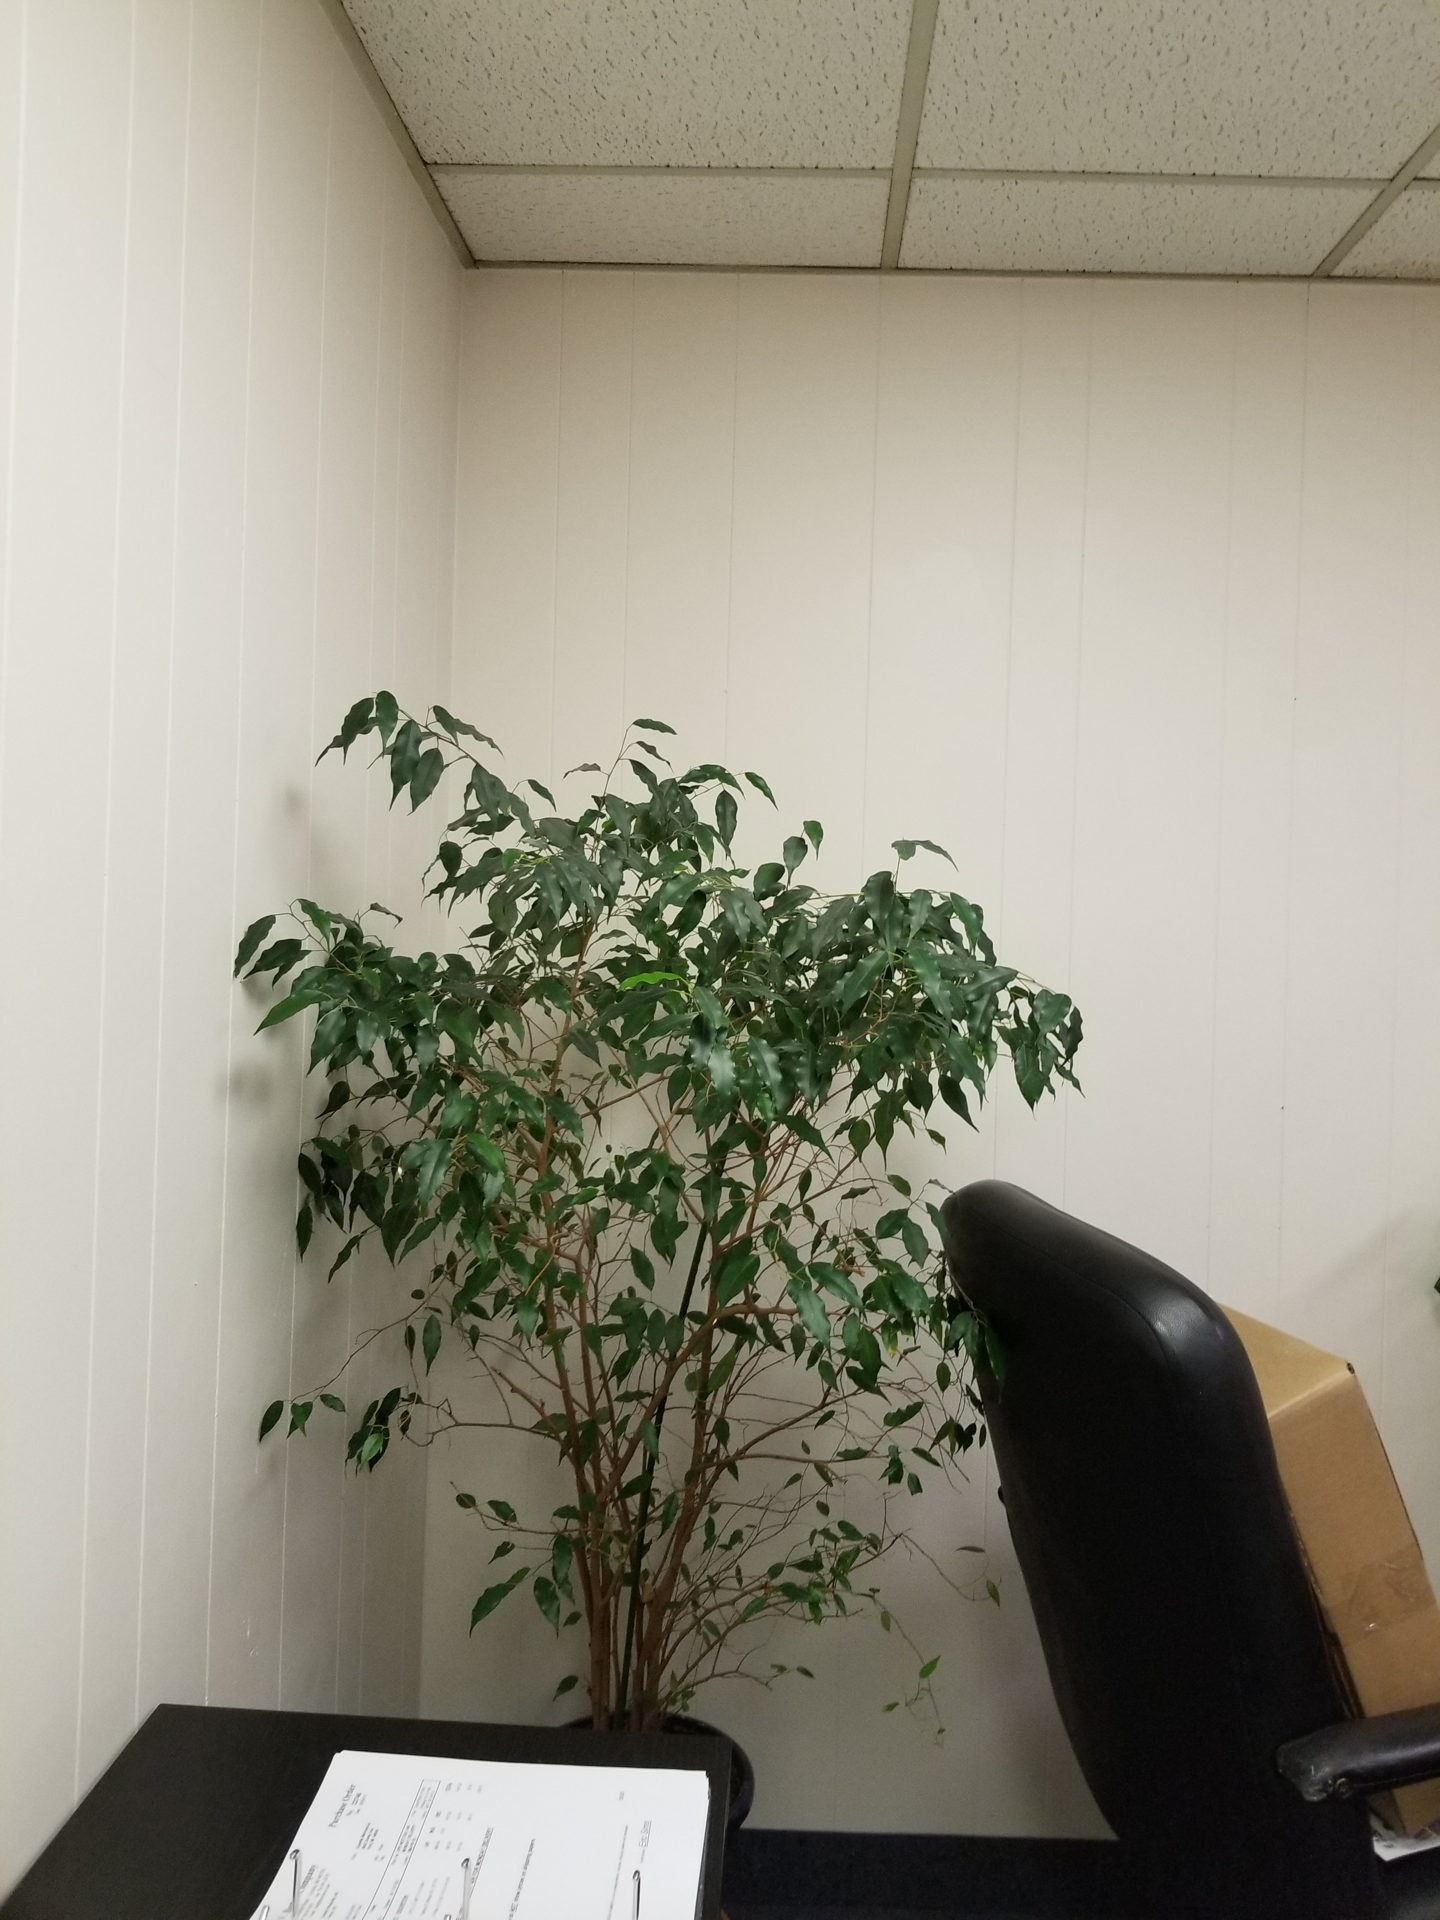 Ficus benjamina in office